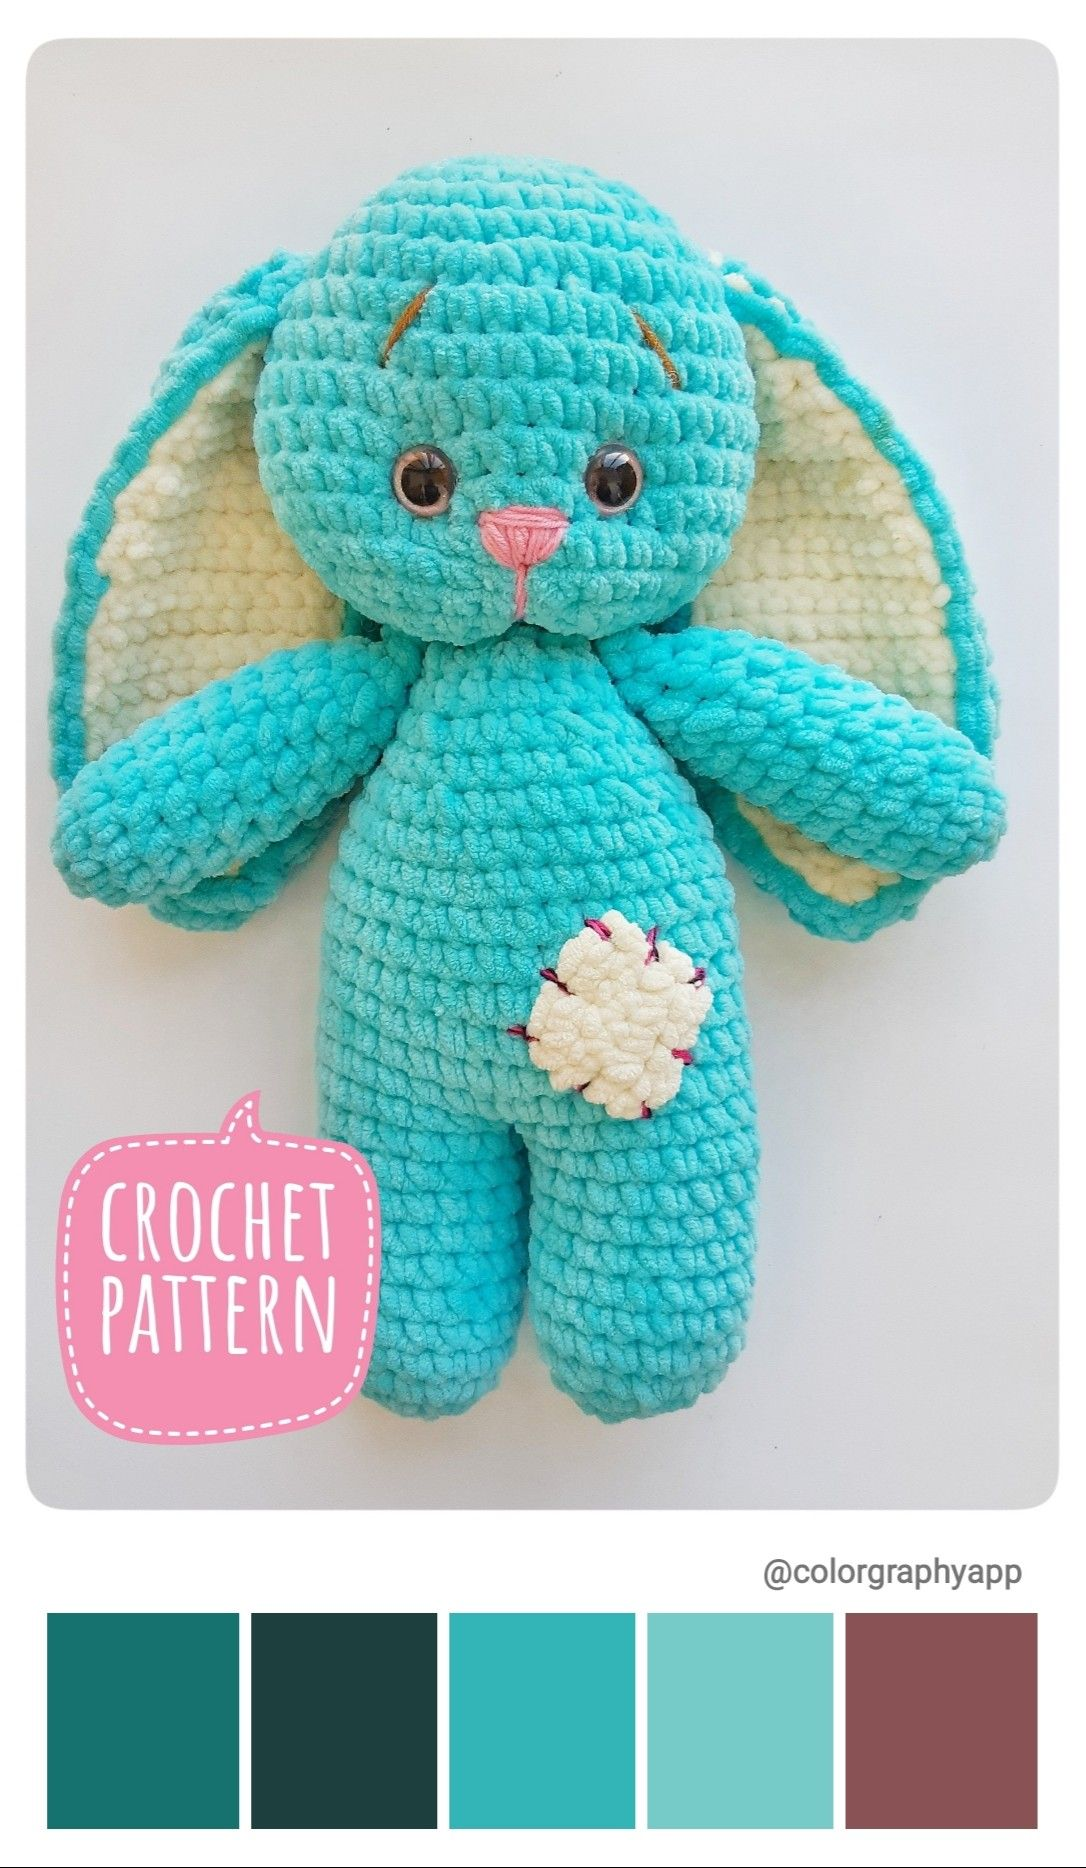 Free and Cute Sleeping Amigurumi Bunny Crochet Pattern - Free ... | 1868x1086